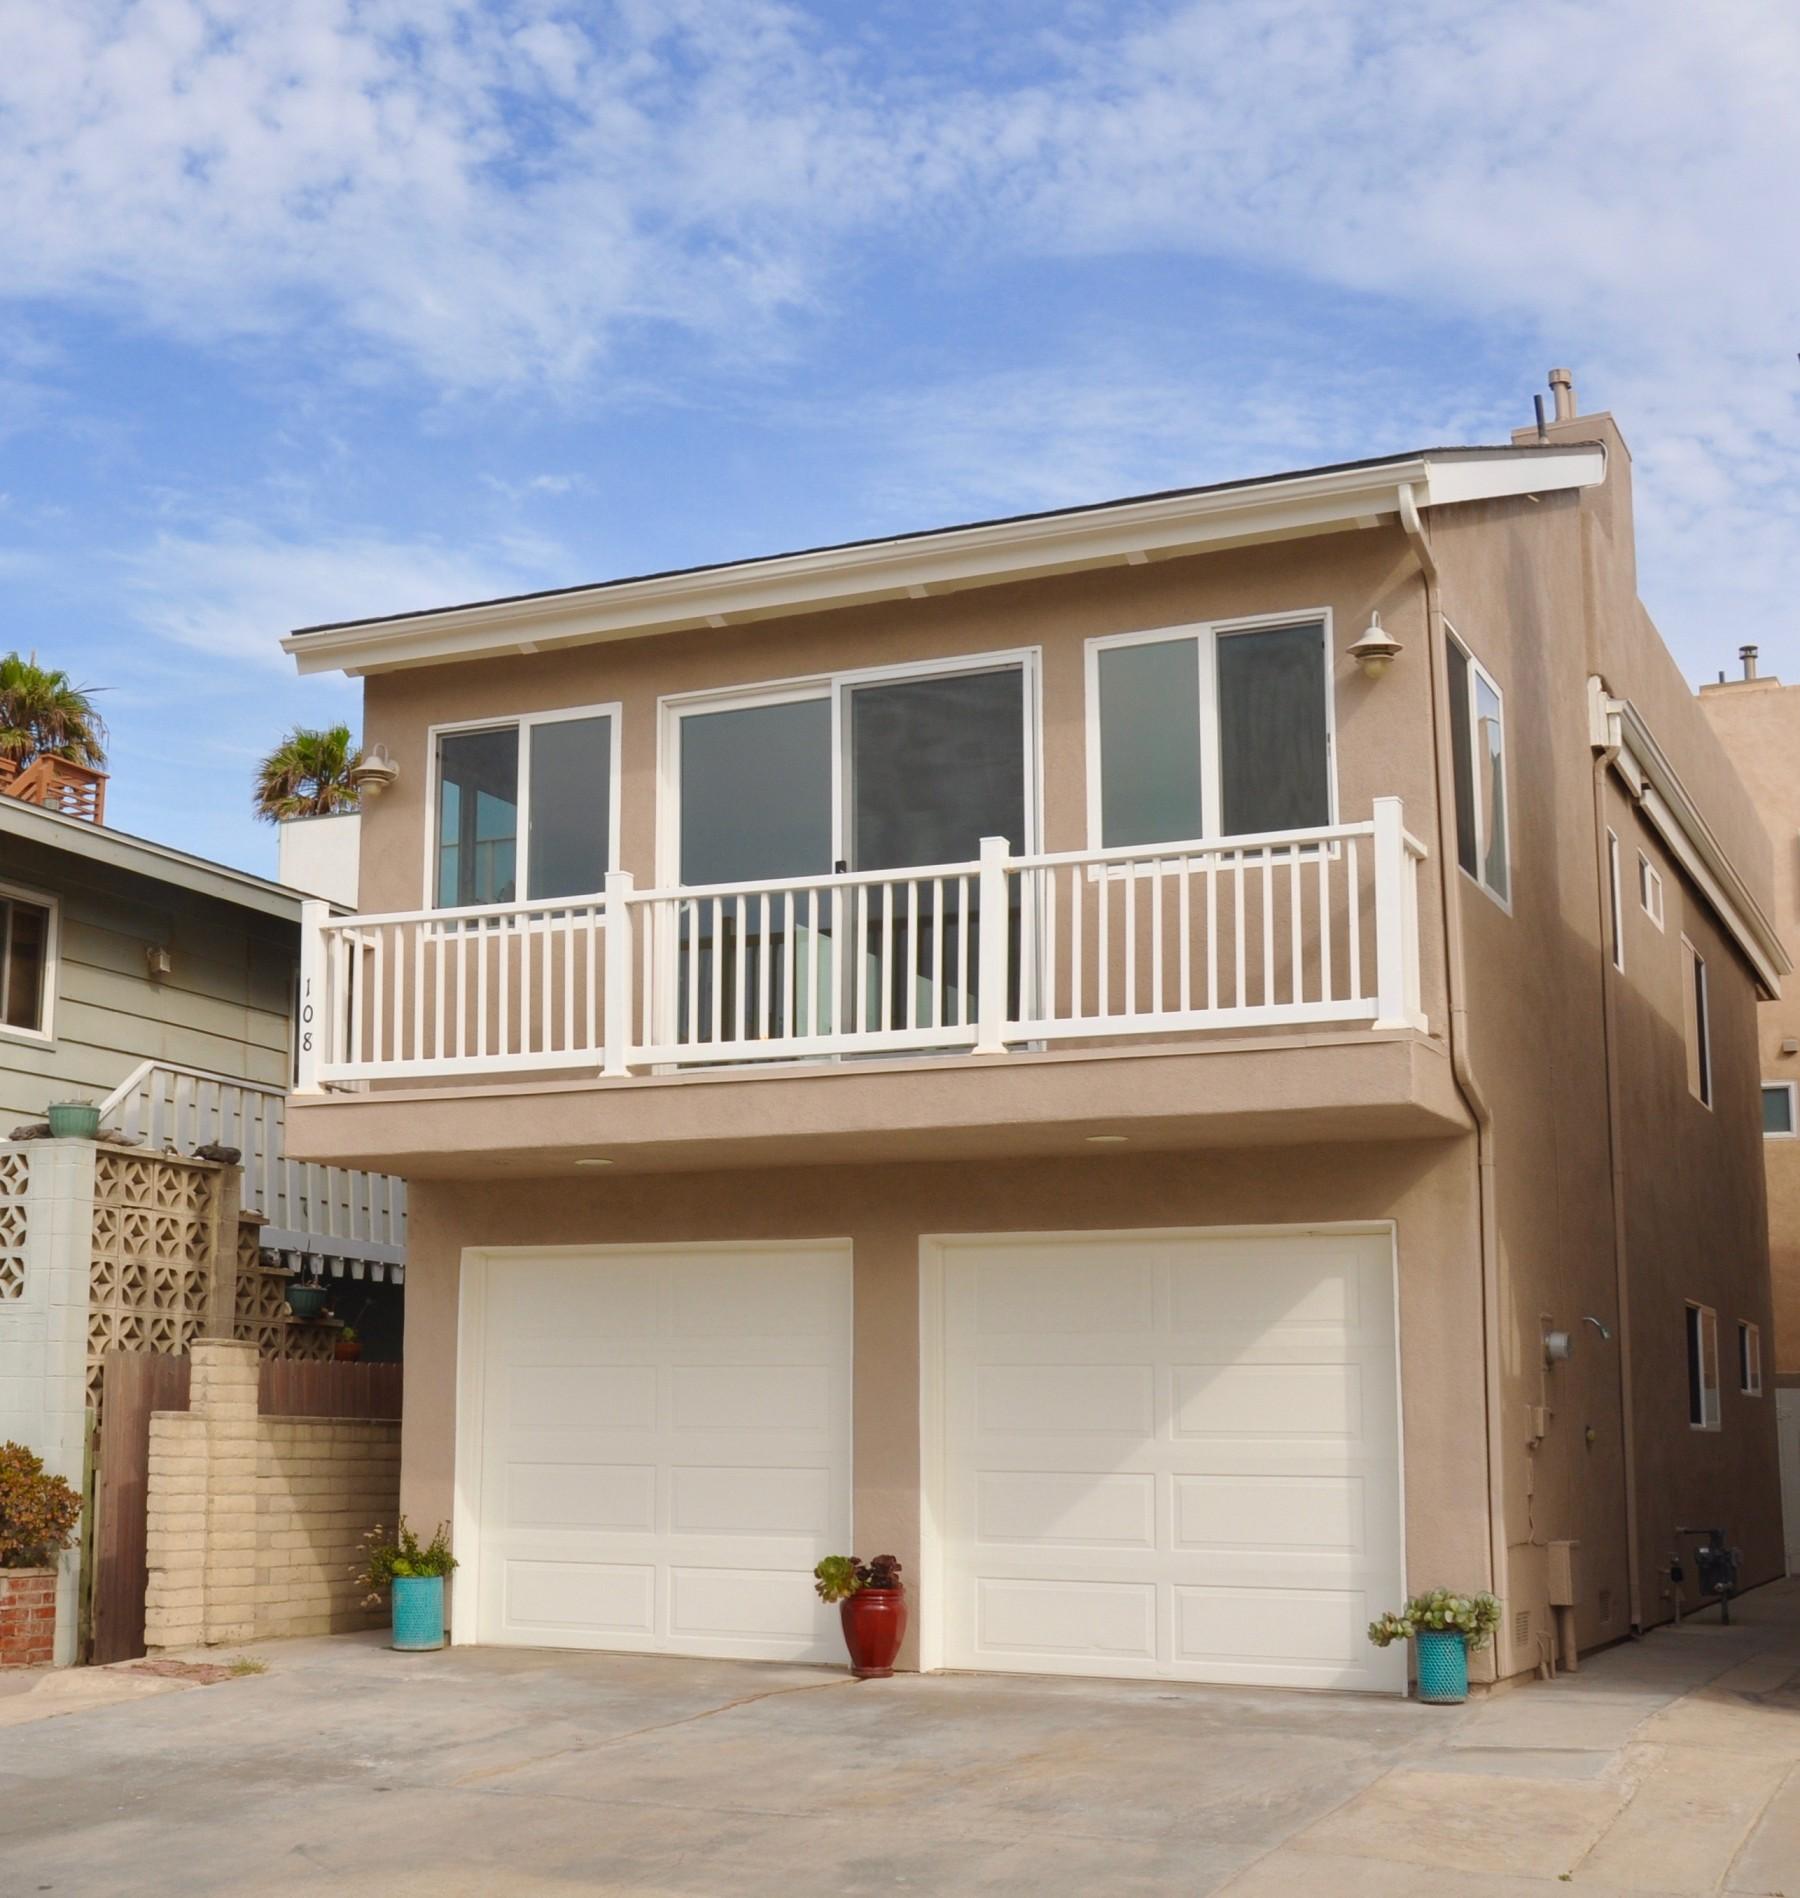 108 Los Robles Street, Oxnard, CA 93035